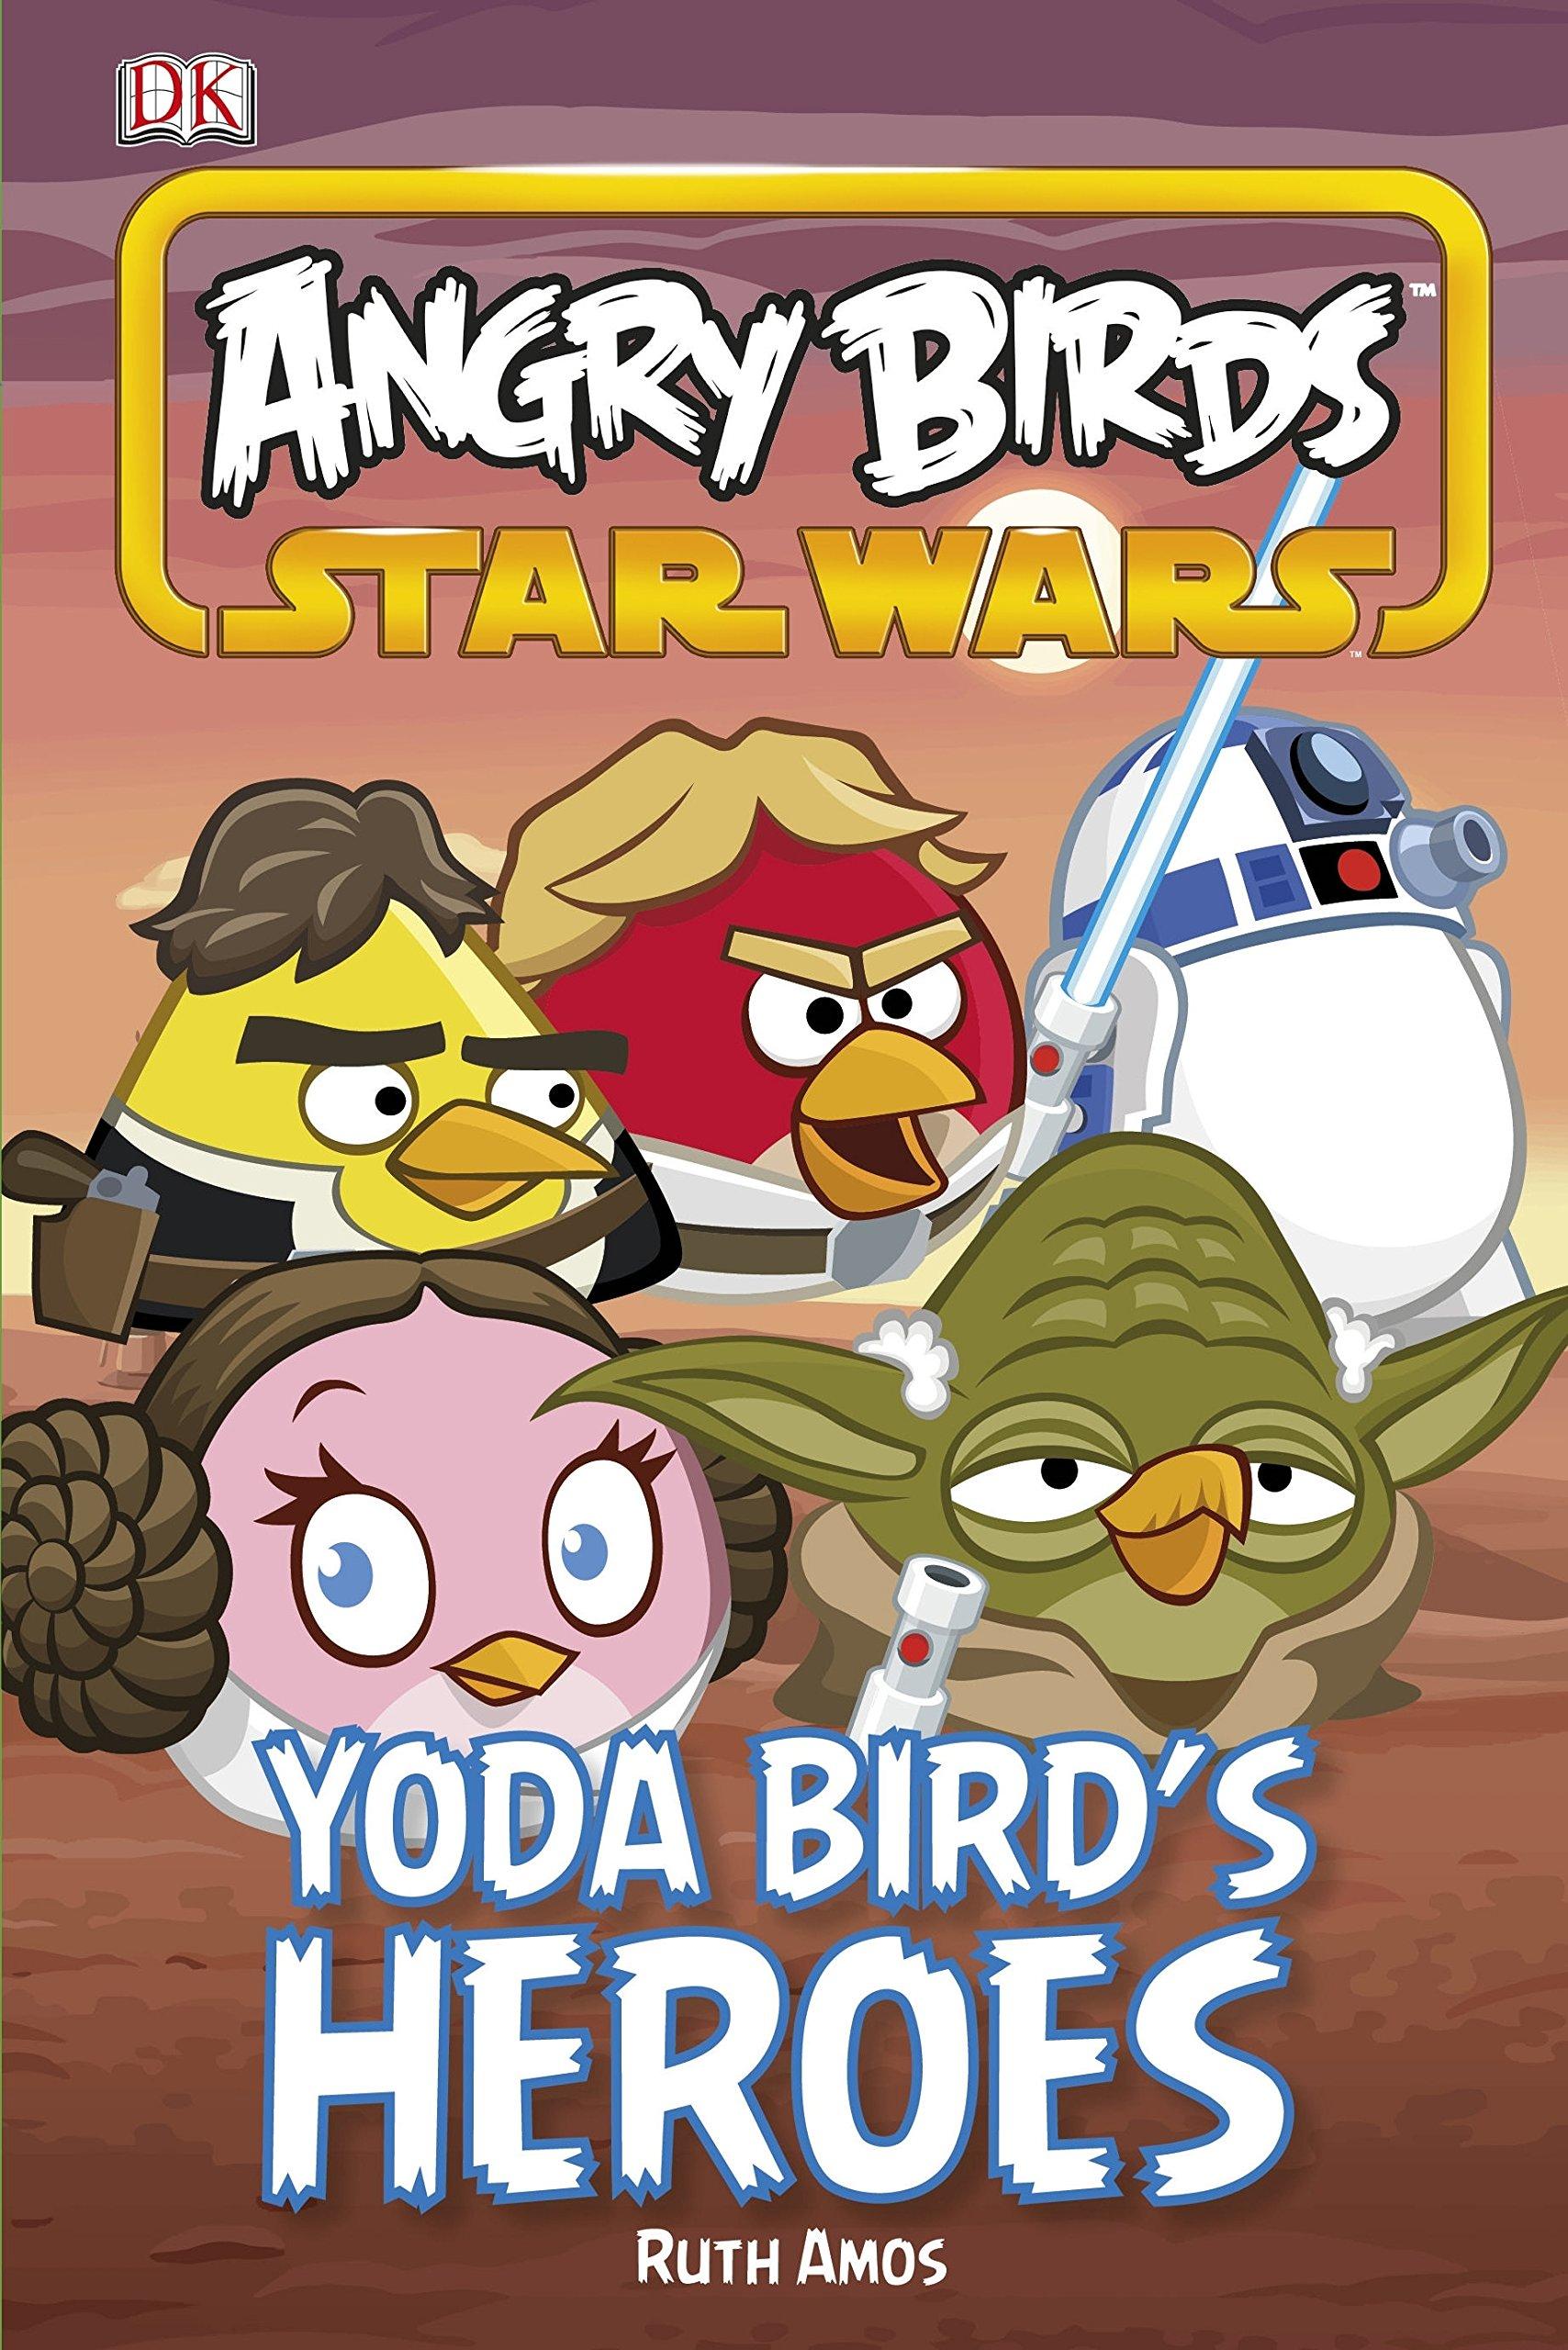 Angry Birds Star Wars: Yoda Bird's Heroes